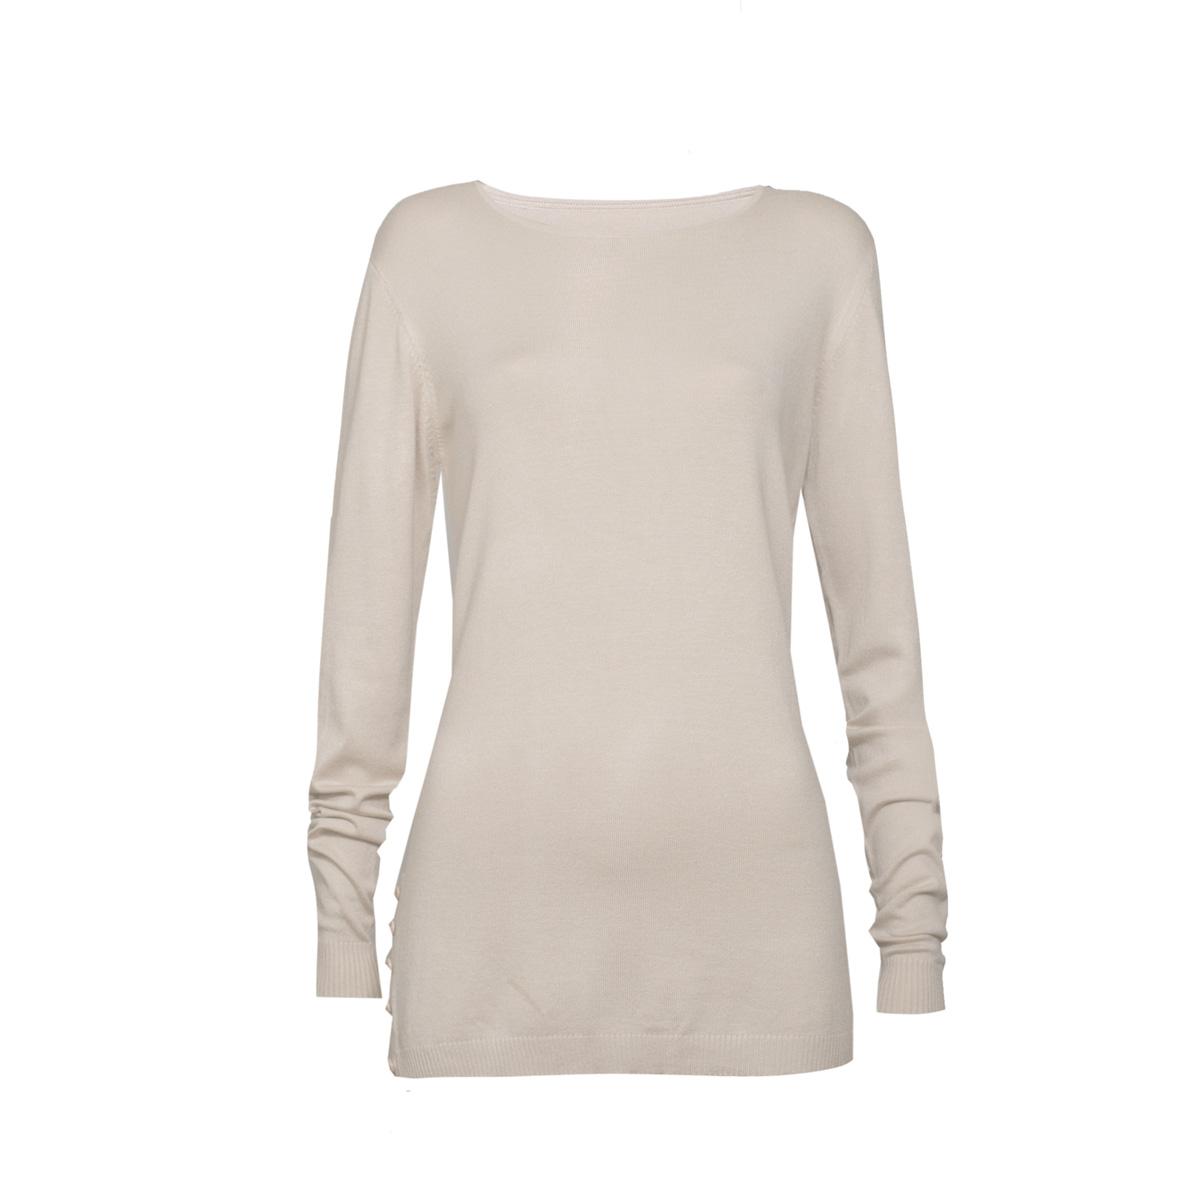 Ženski pulover, bež